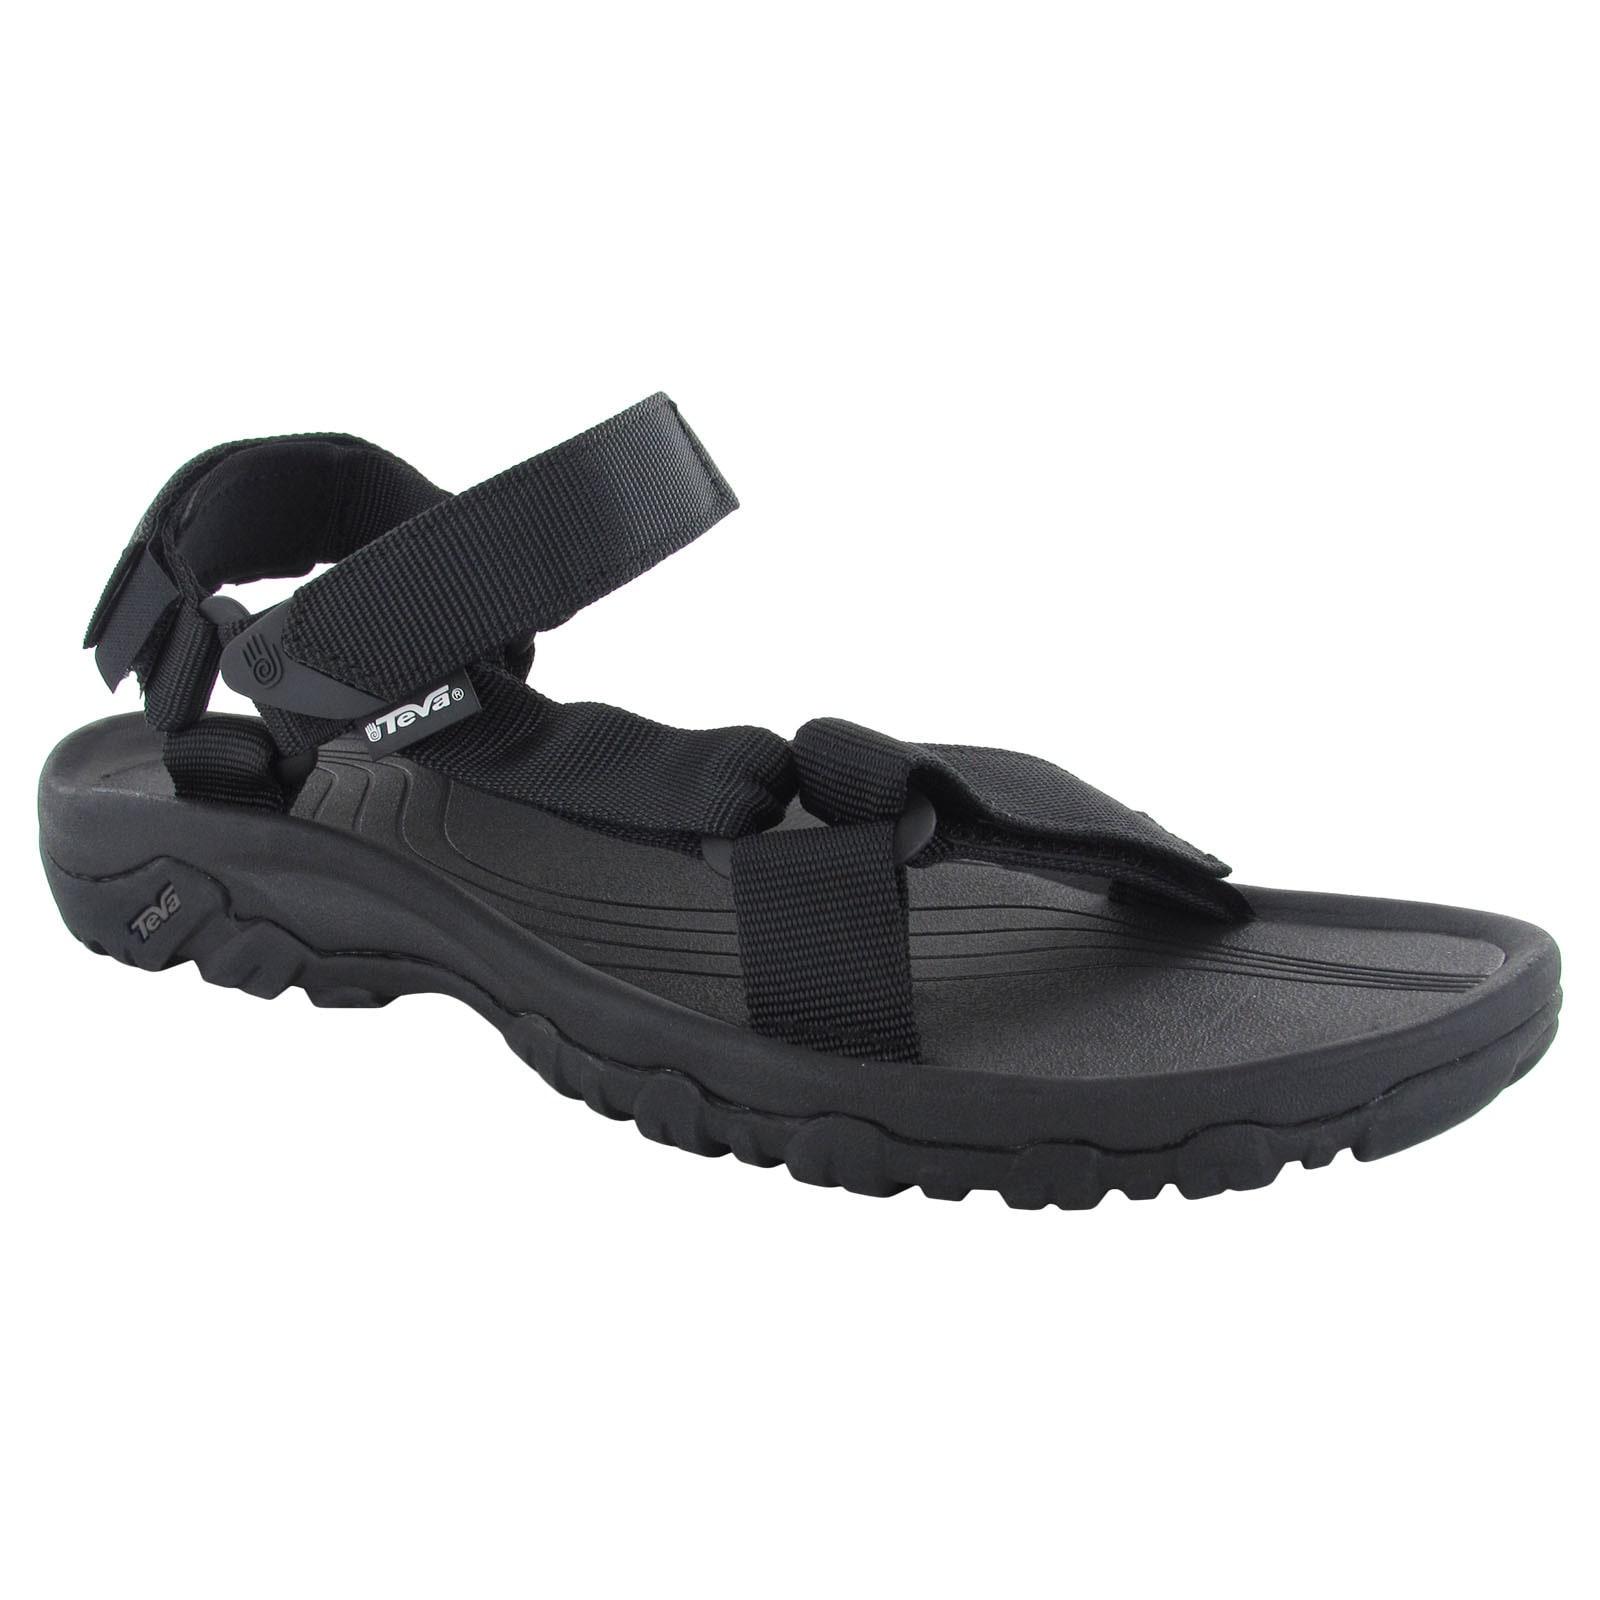 Shop Teva Mens Hurricane XLT Athletic Sandals - Free Shipping On ... cd83a5dee6